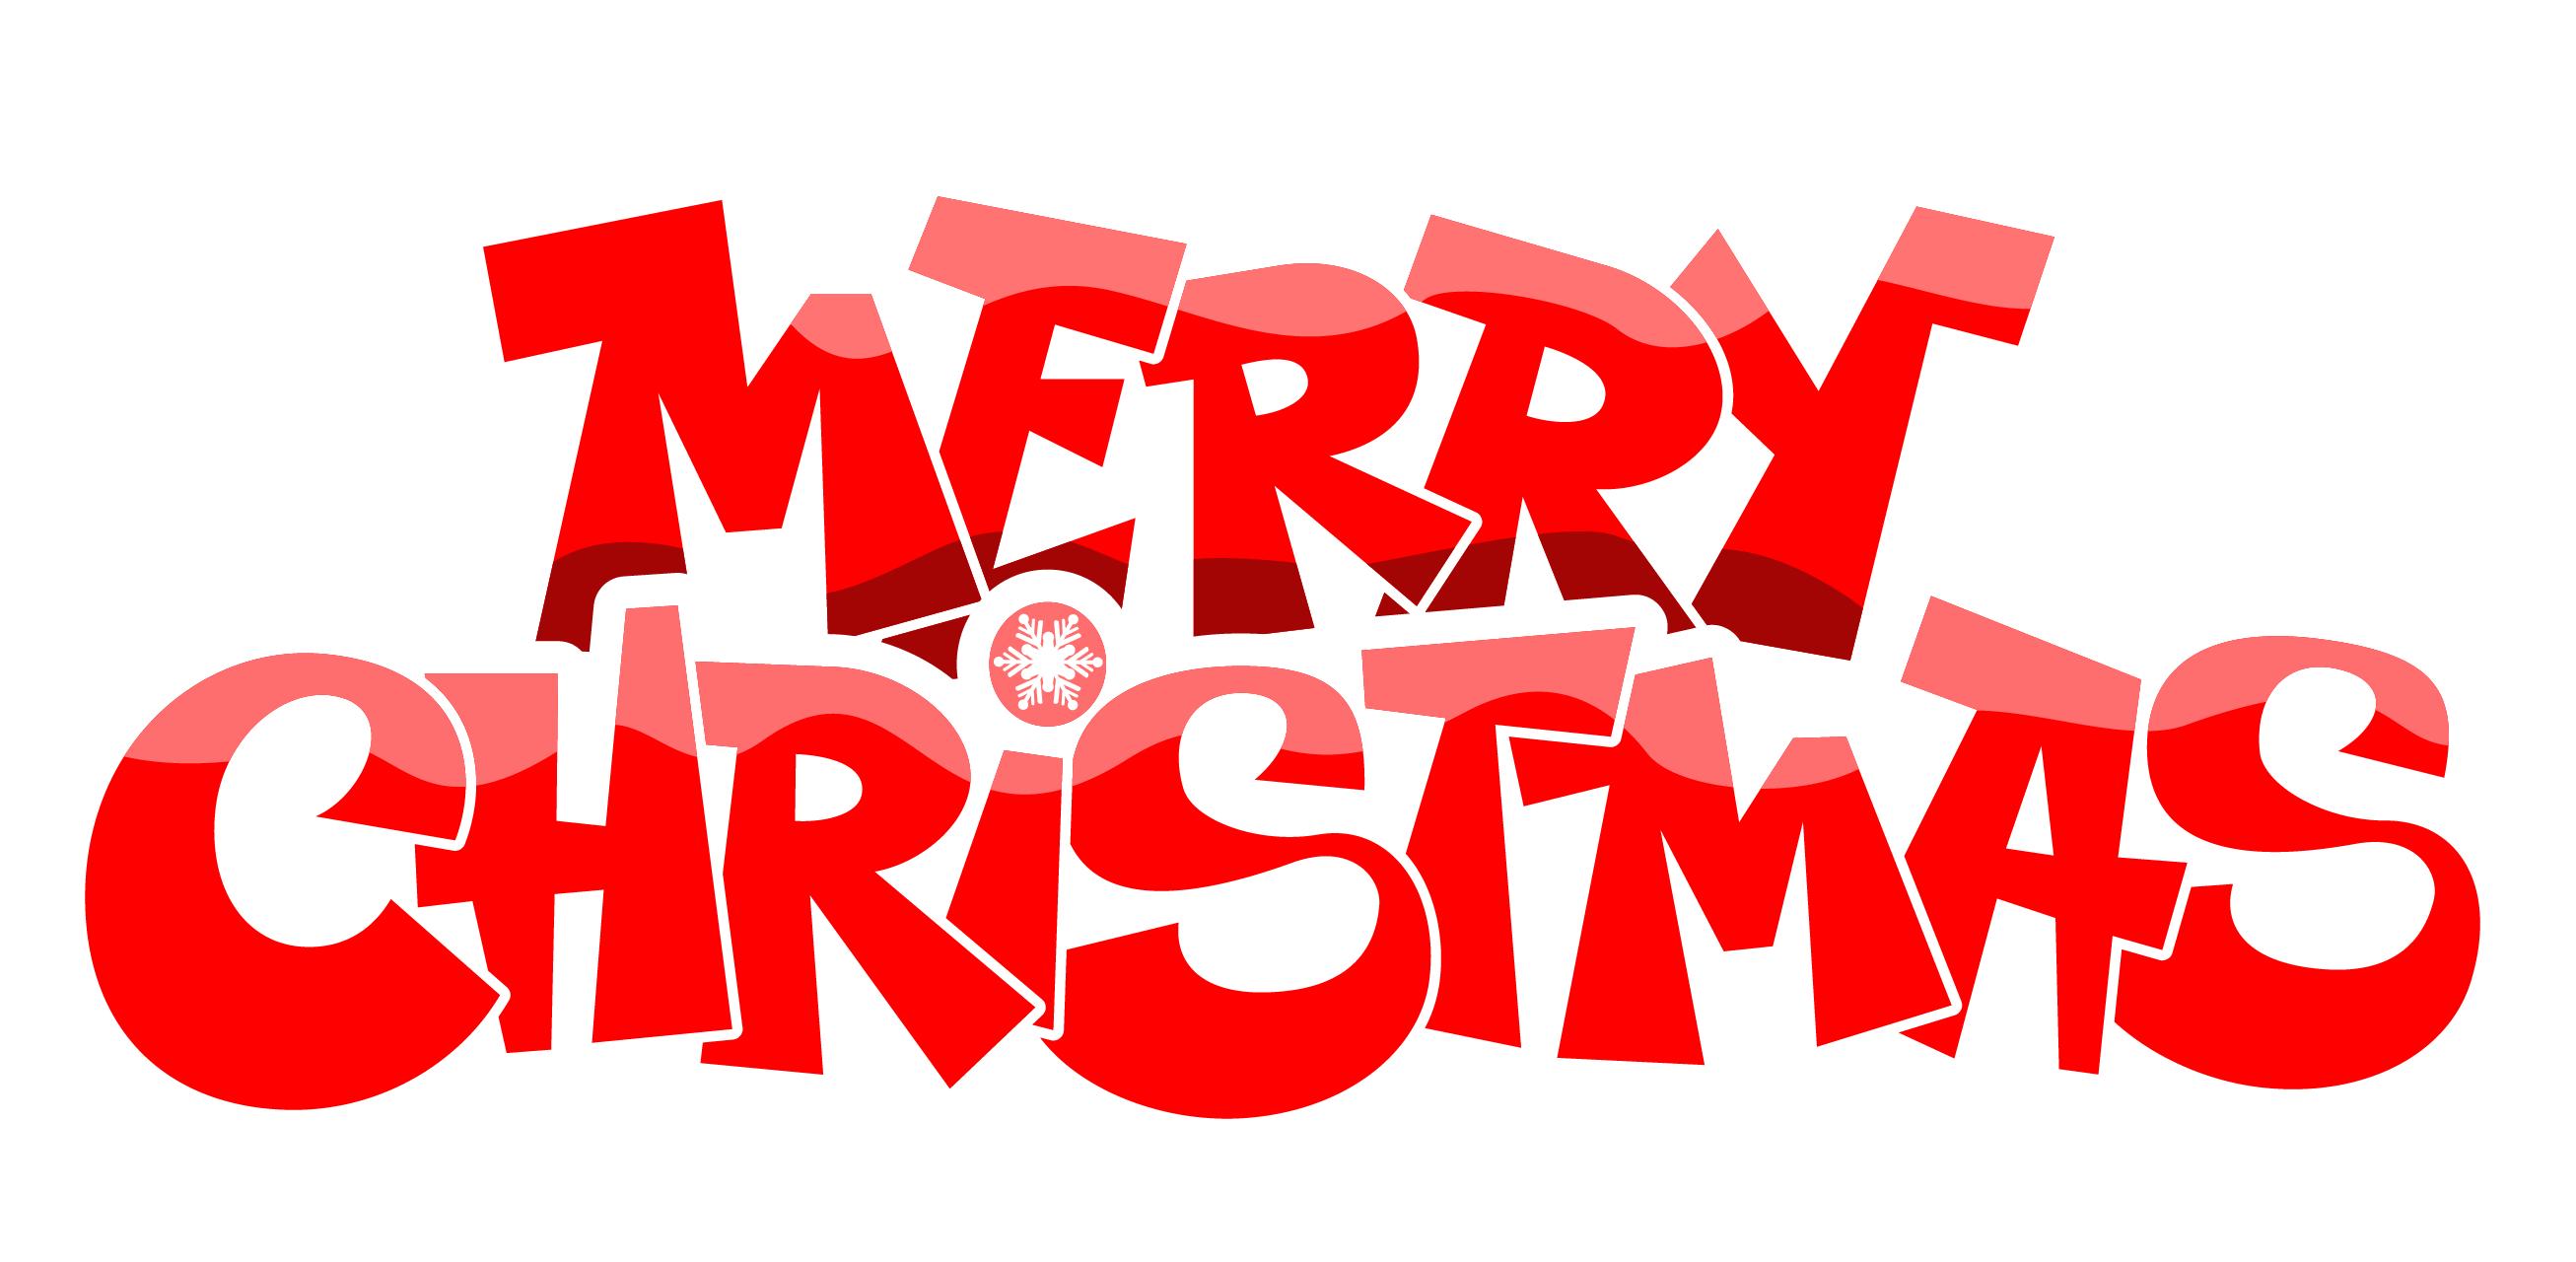 A christmas carol clipart image transparent download A Christmas carol, sort of.   Elena Linville's Tower of Winds image transparent download